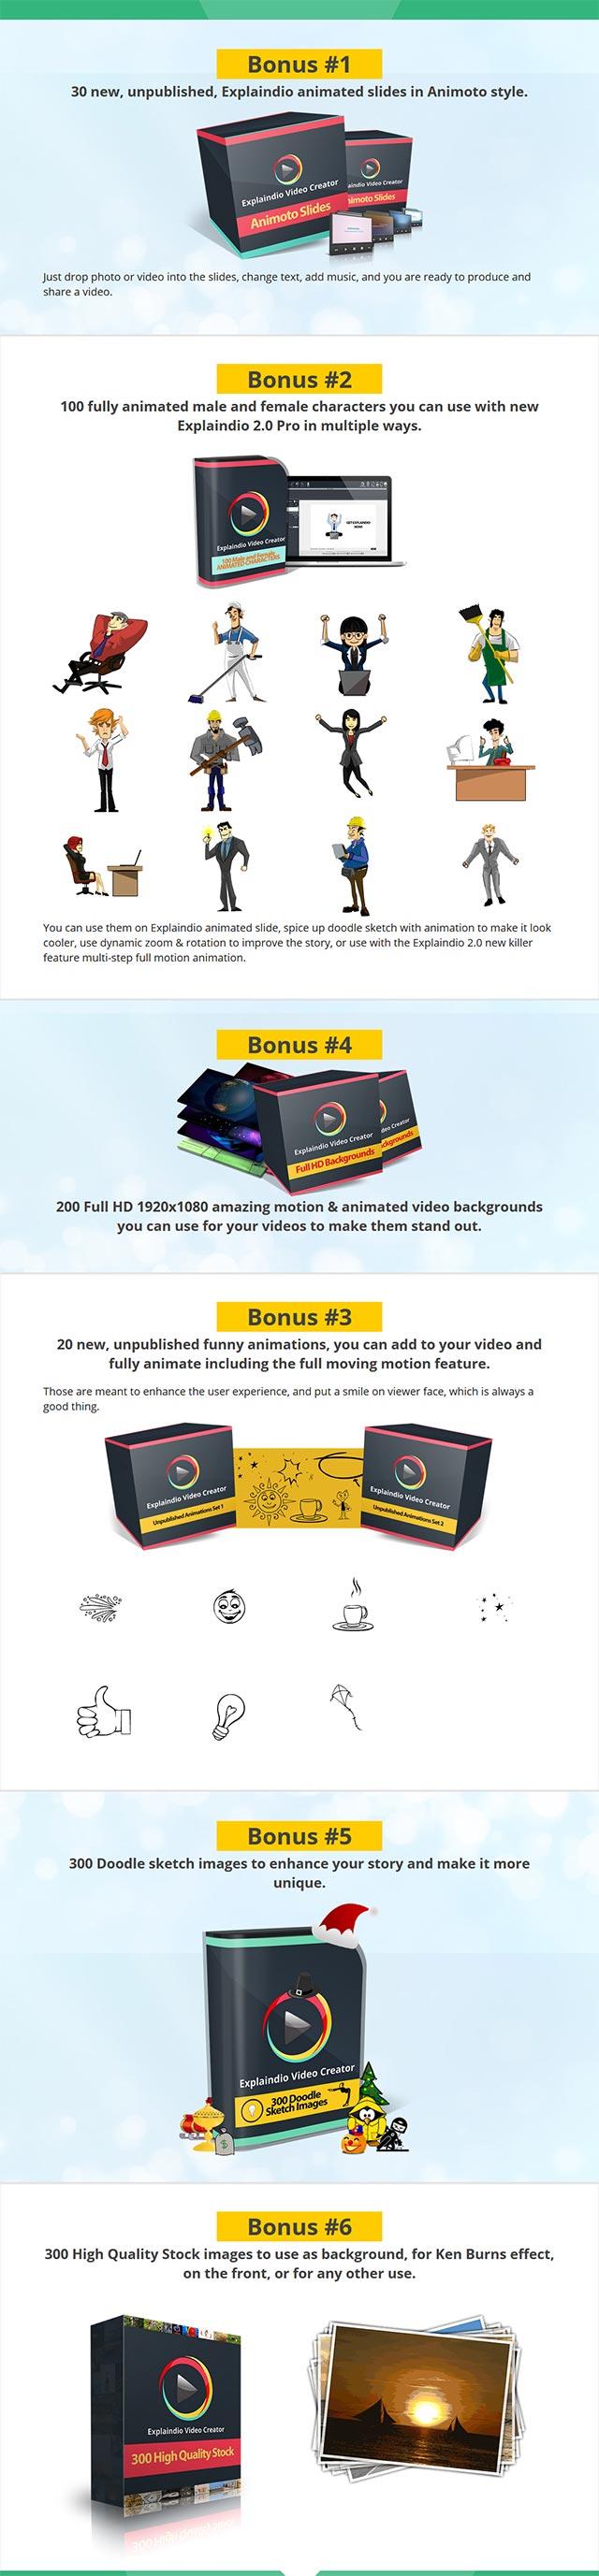 Explaindio-Video-Creator-2_0---Erklärvideos-selber-machen-BLOG